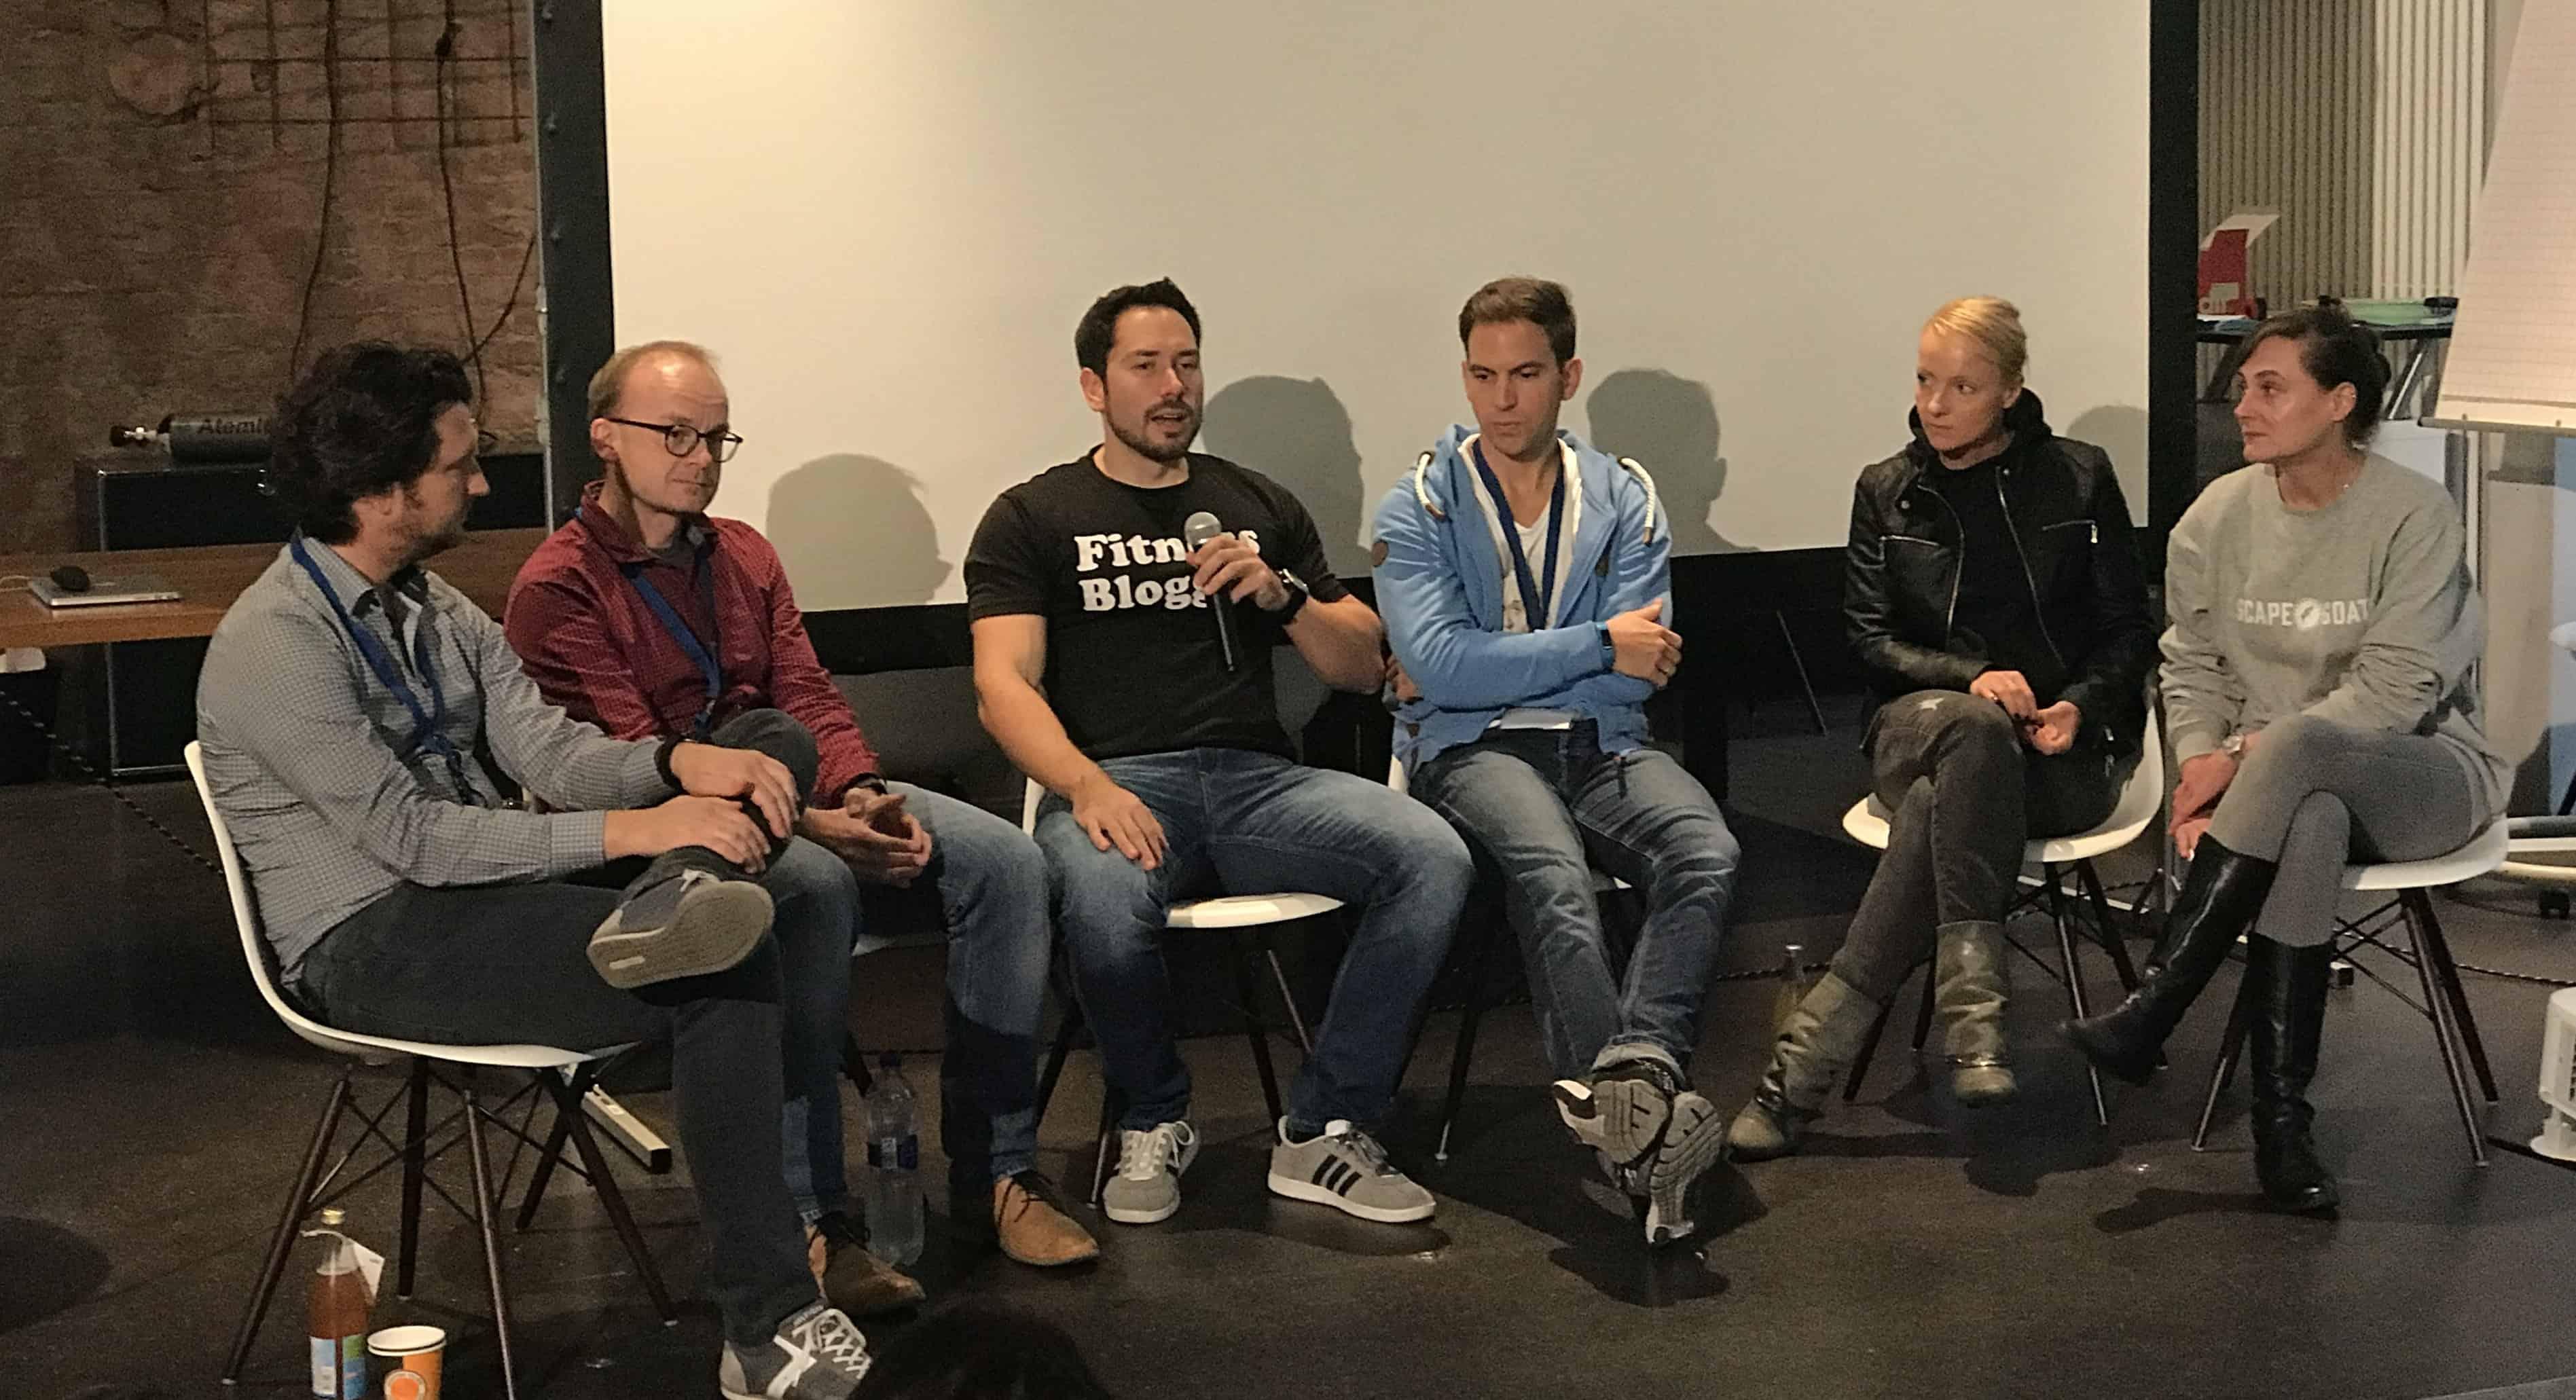 Die 2. Fibloko – Networking unter Fitnessbloggern